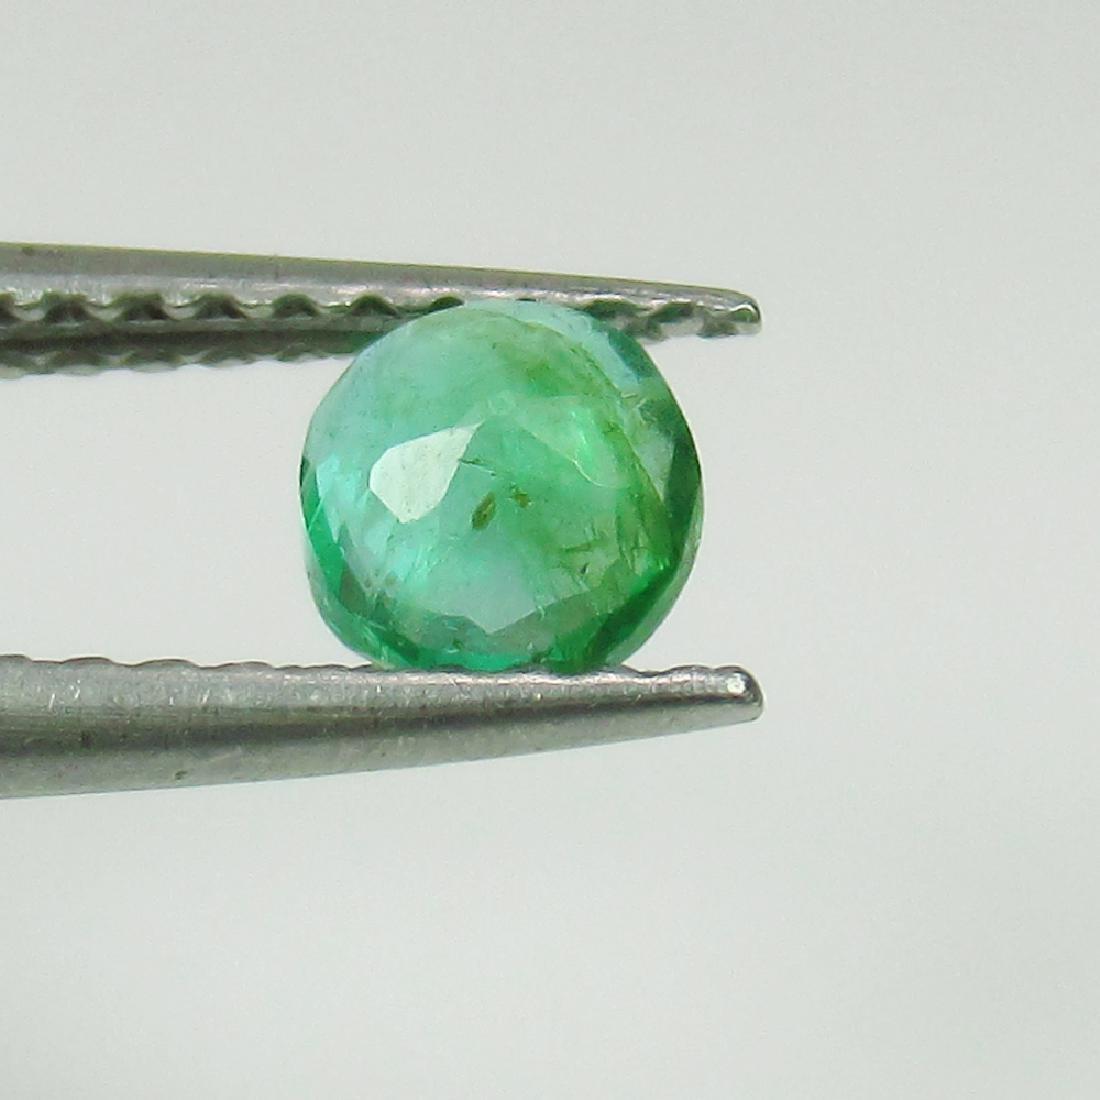 0.36 Ct Genuine Loose Zambian Emerald Good Luster 4.6 - 2